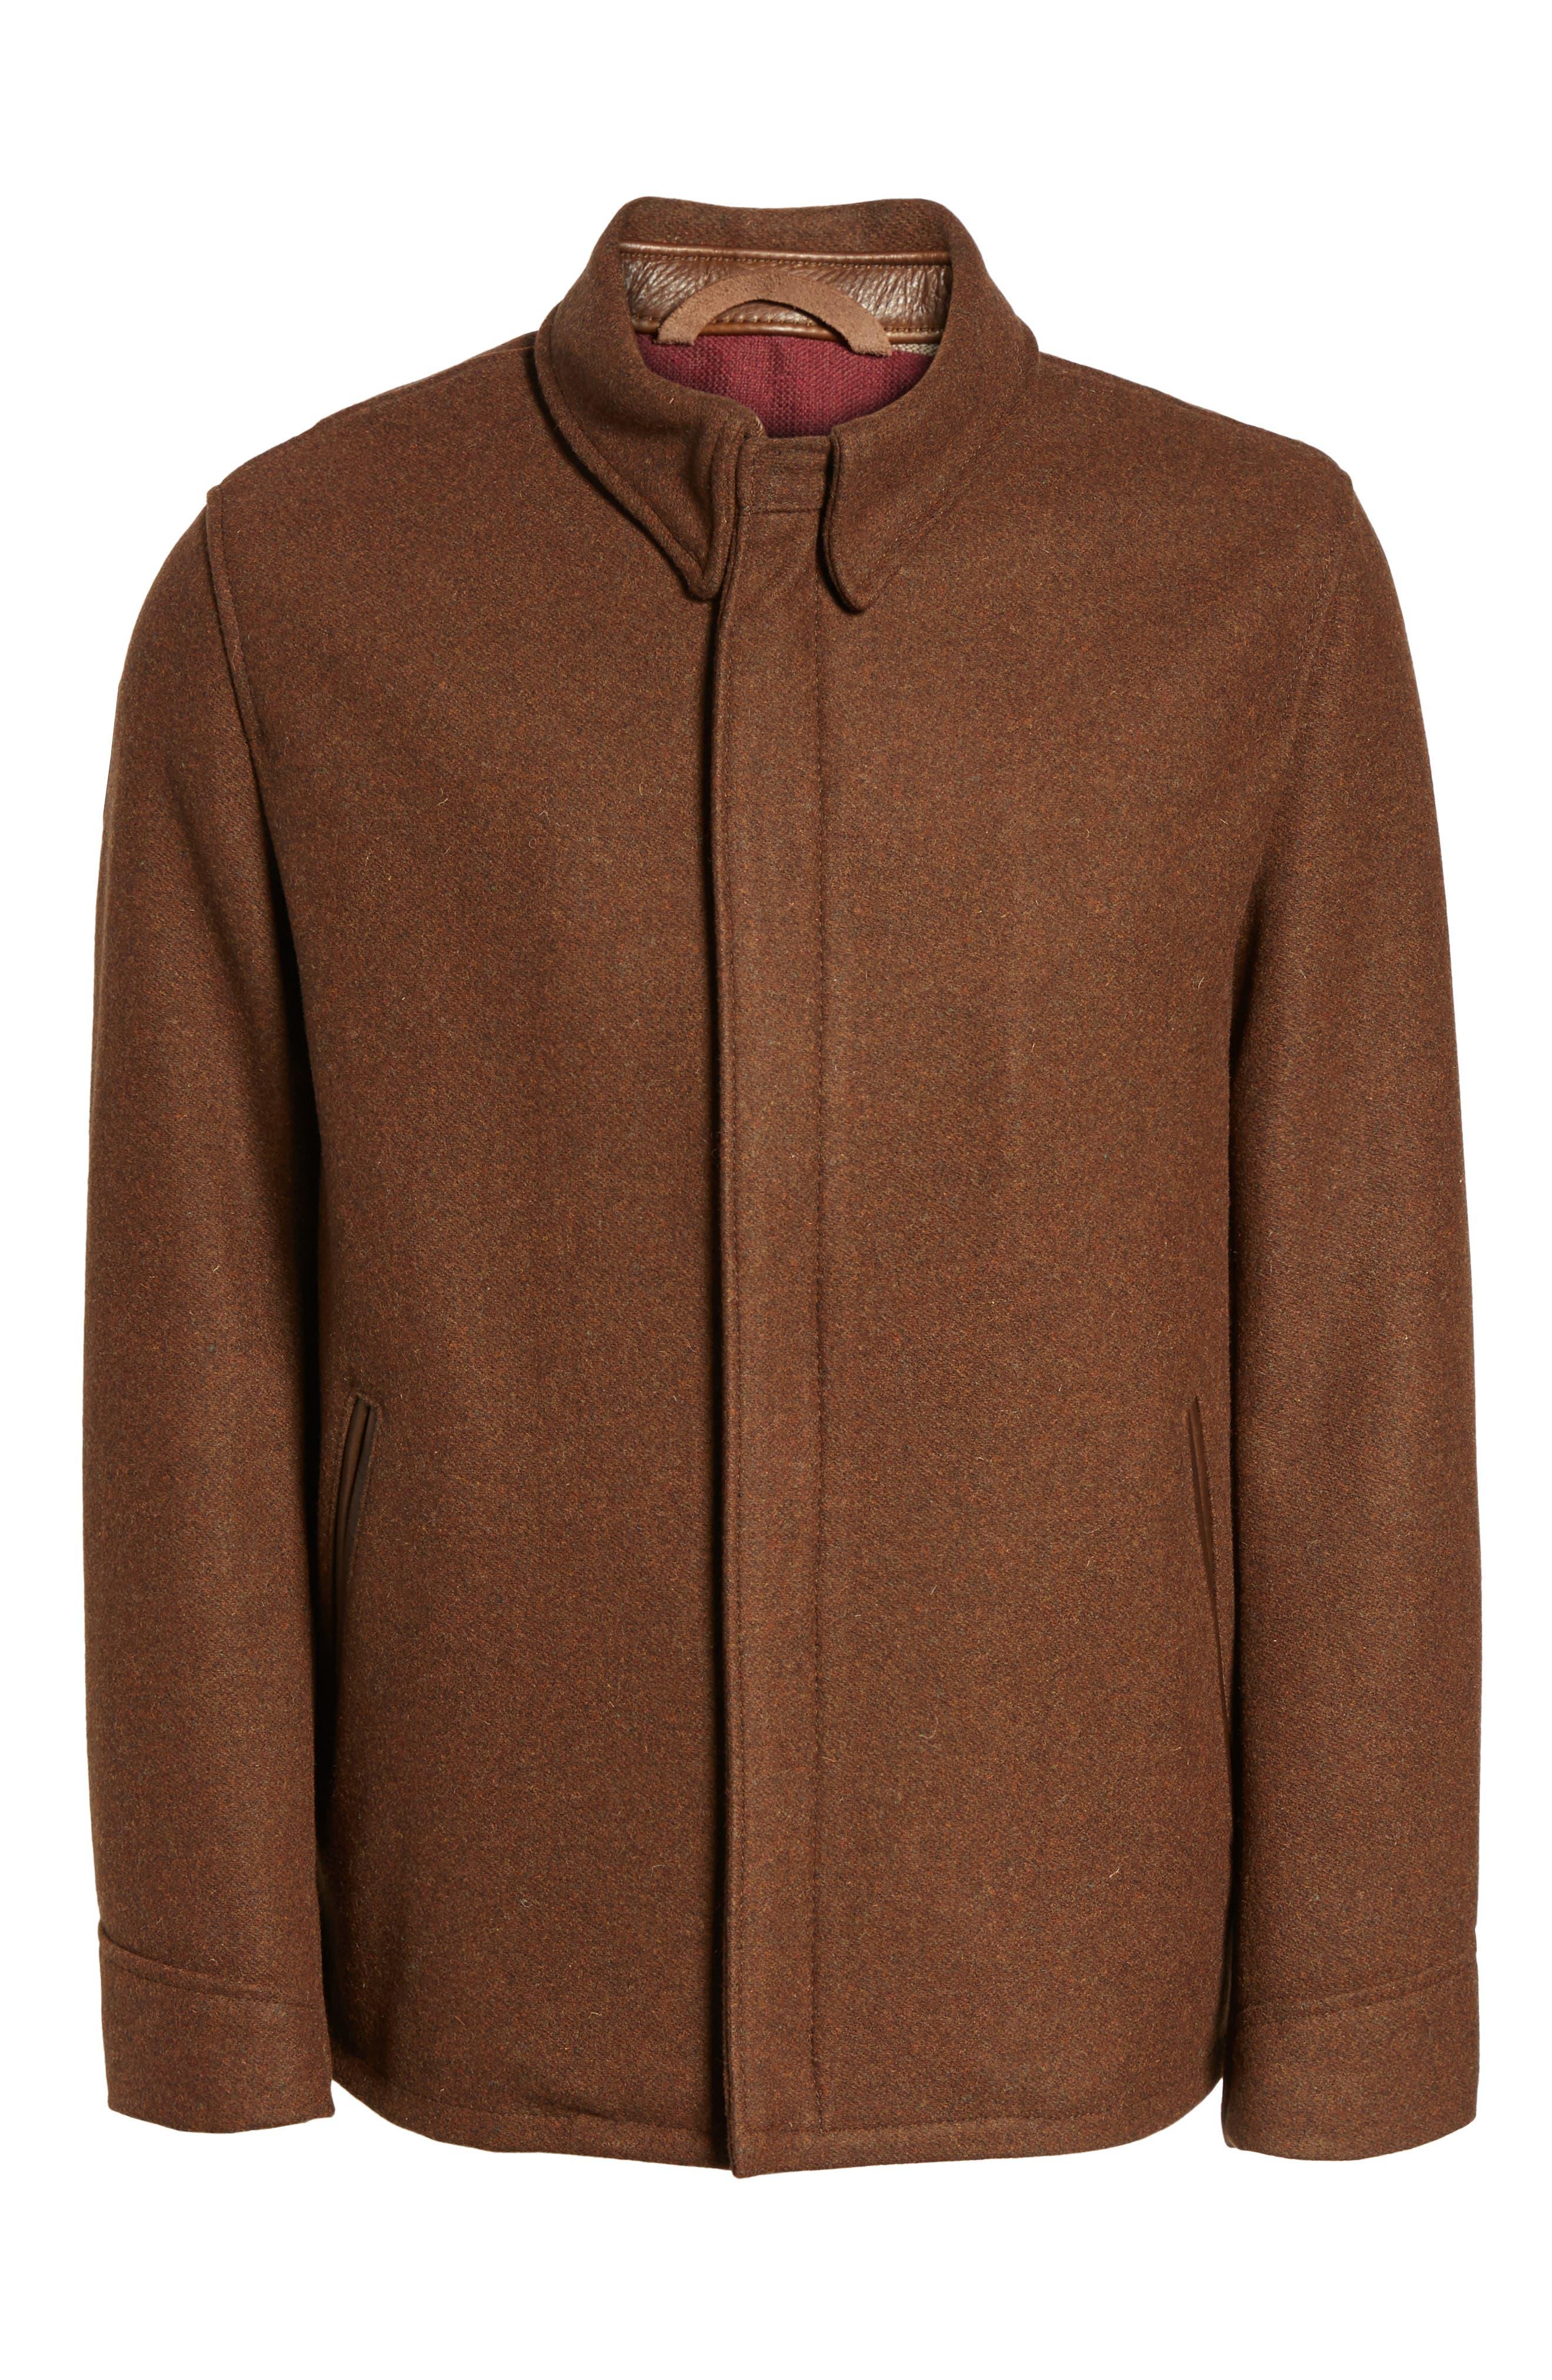 Liberty Wool Blend Zip Front Jacket,                             Alternate thumbnail 5, color,                             200